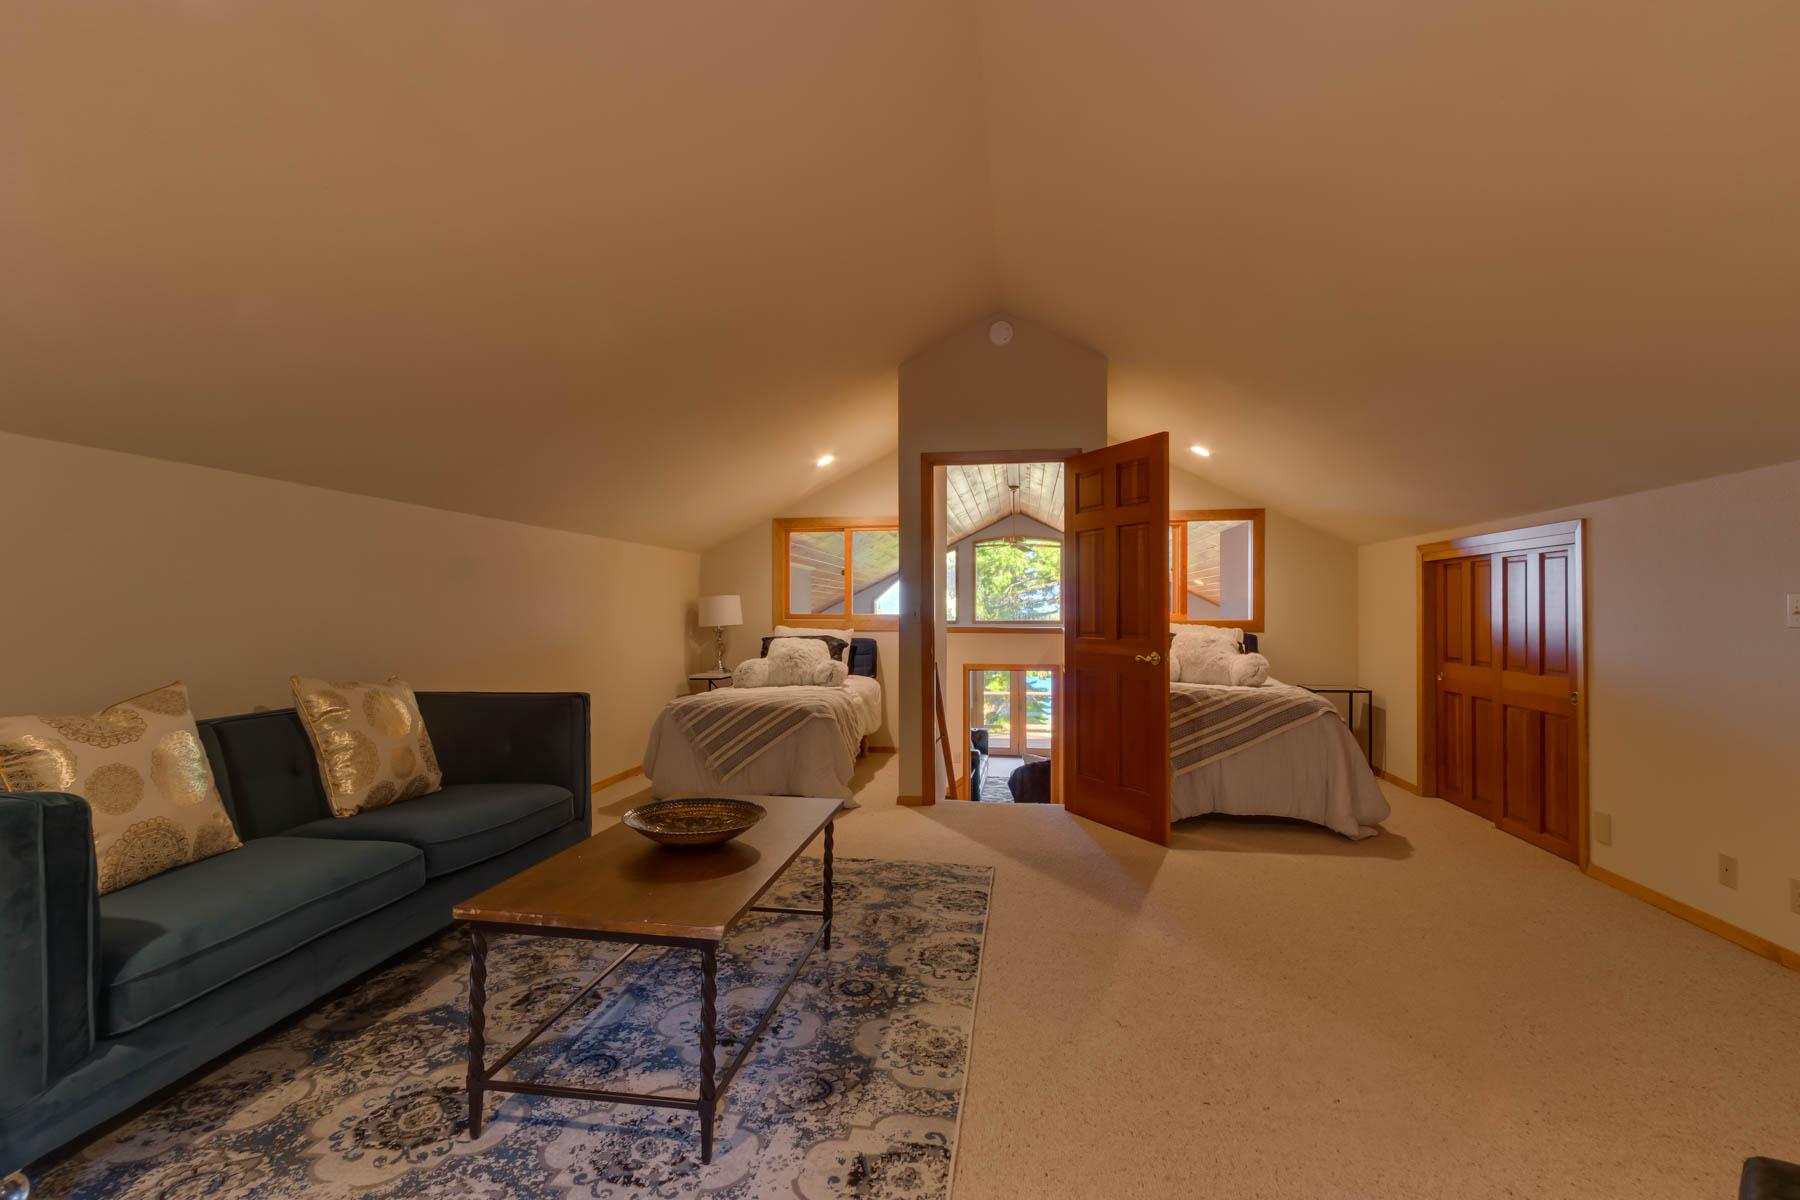 Additional photo for property listing at 4520 Ridgewood Drive, Carnelian Bay, CA 96140 4520 Ridgewood Drive Carnelian Bay, California 96140 United States